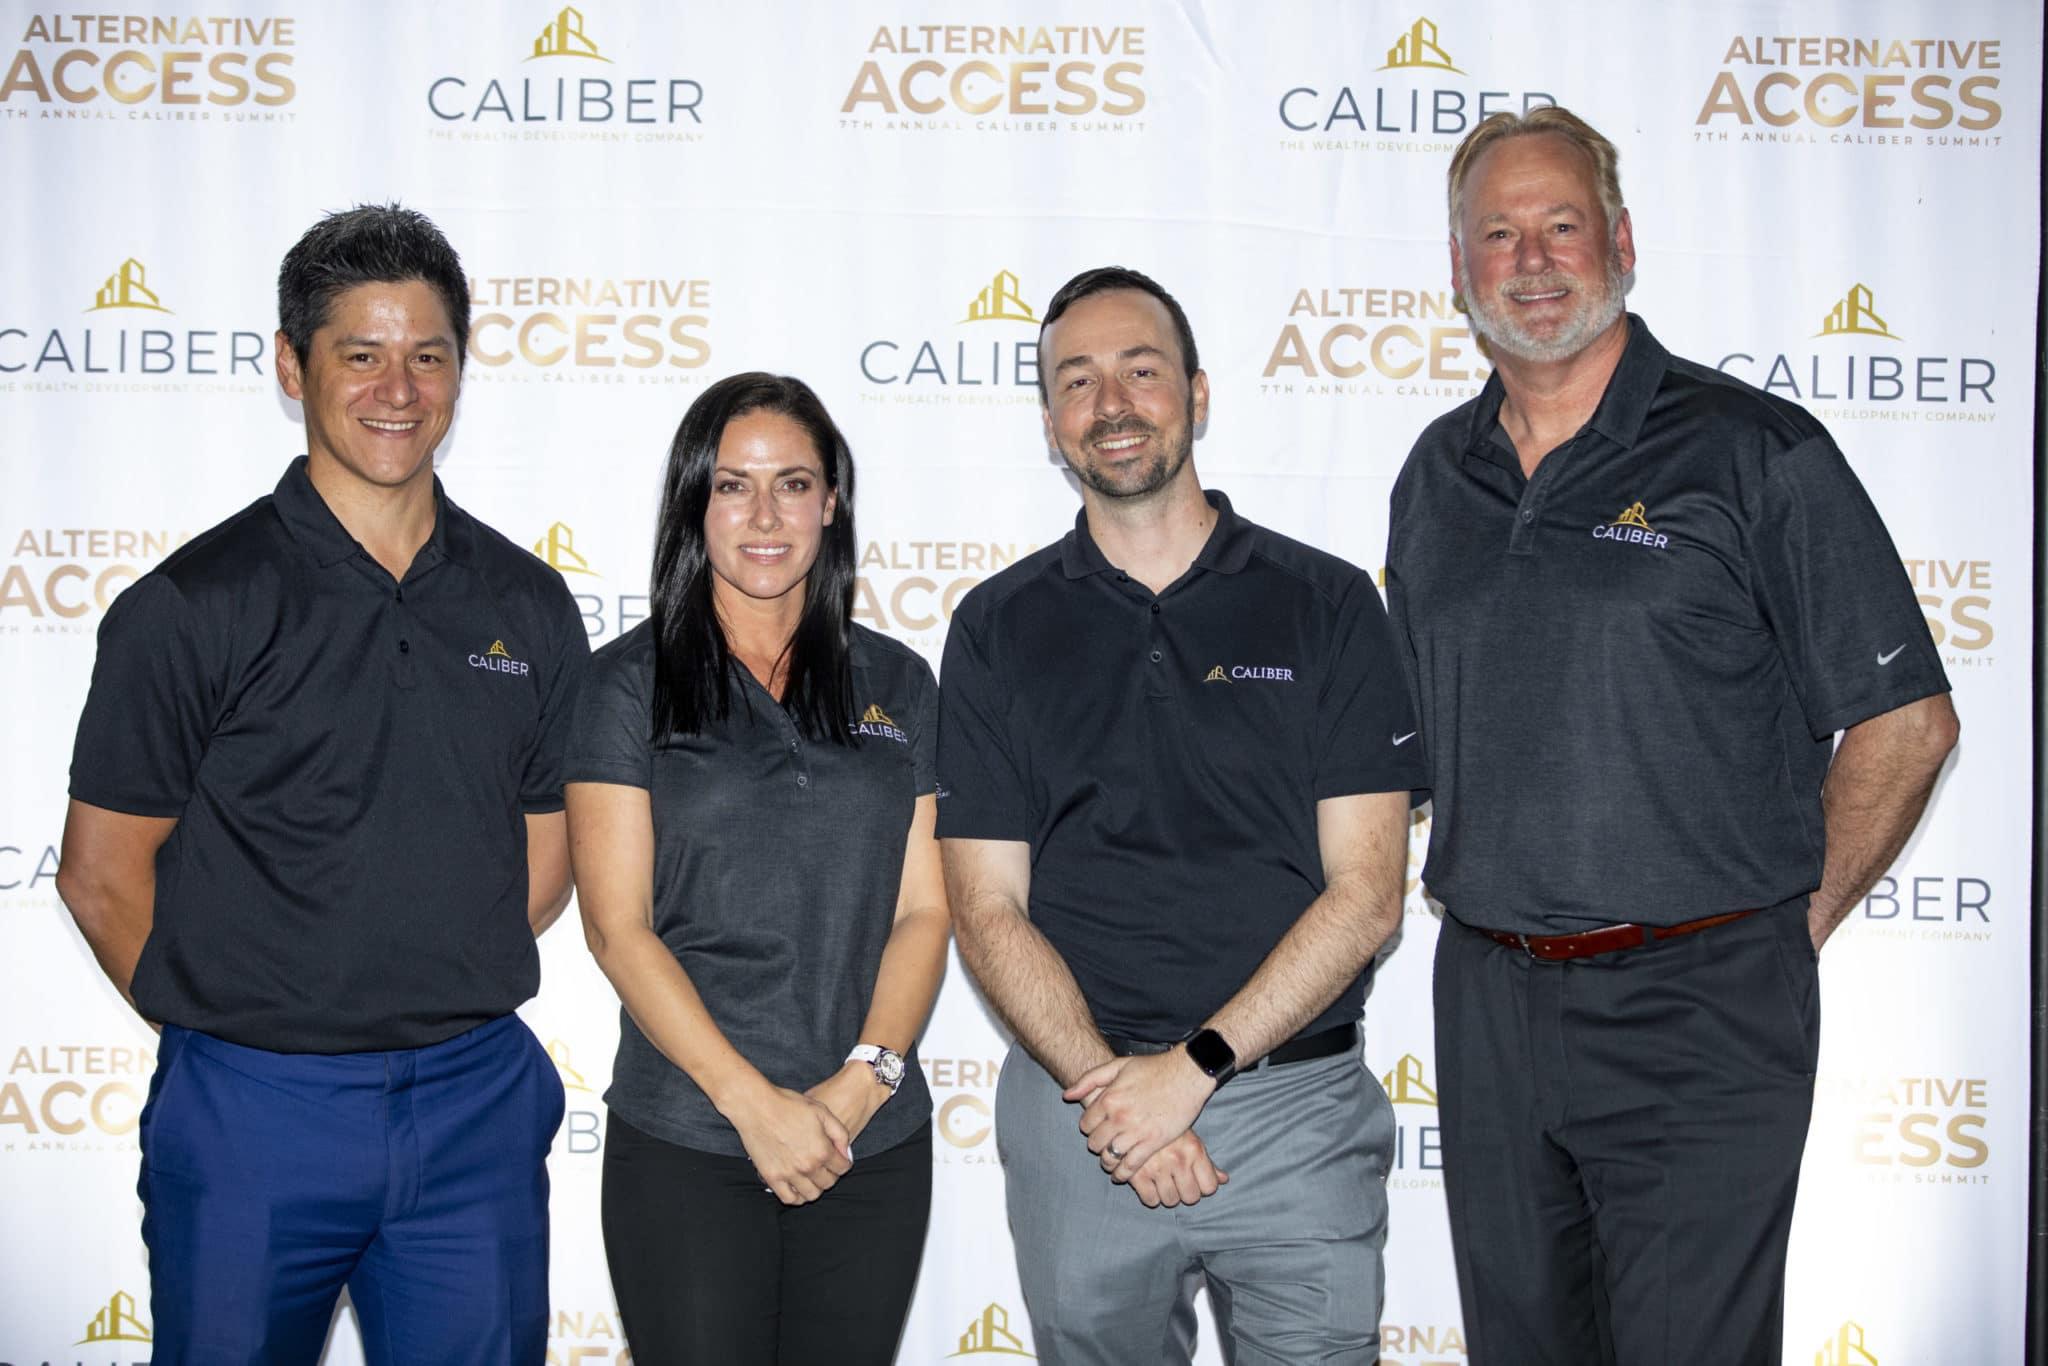 Caliber executives (left to right): Jade Leung, Jennifer Schrader, Chris Loeffler, Roy Bade